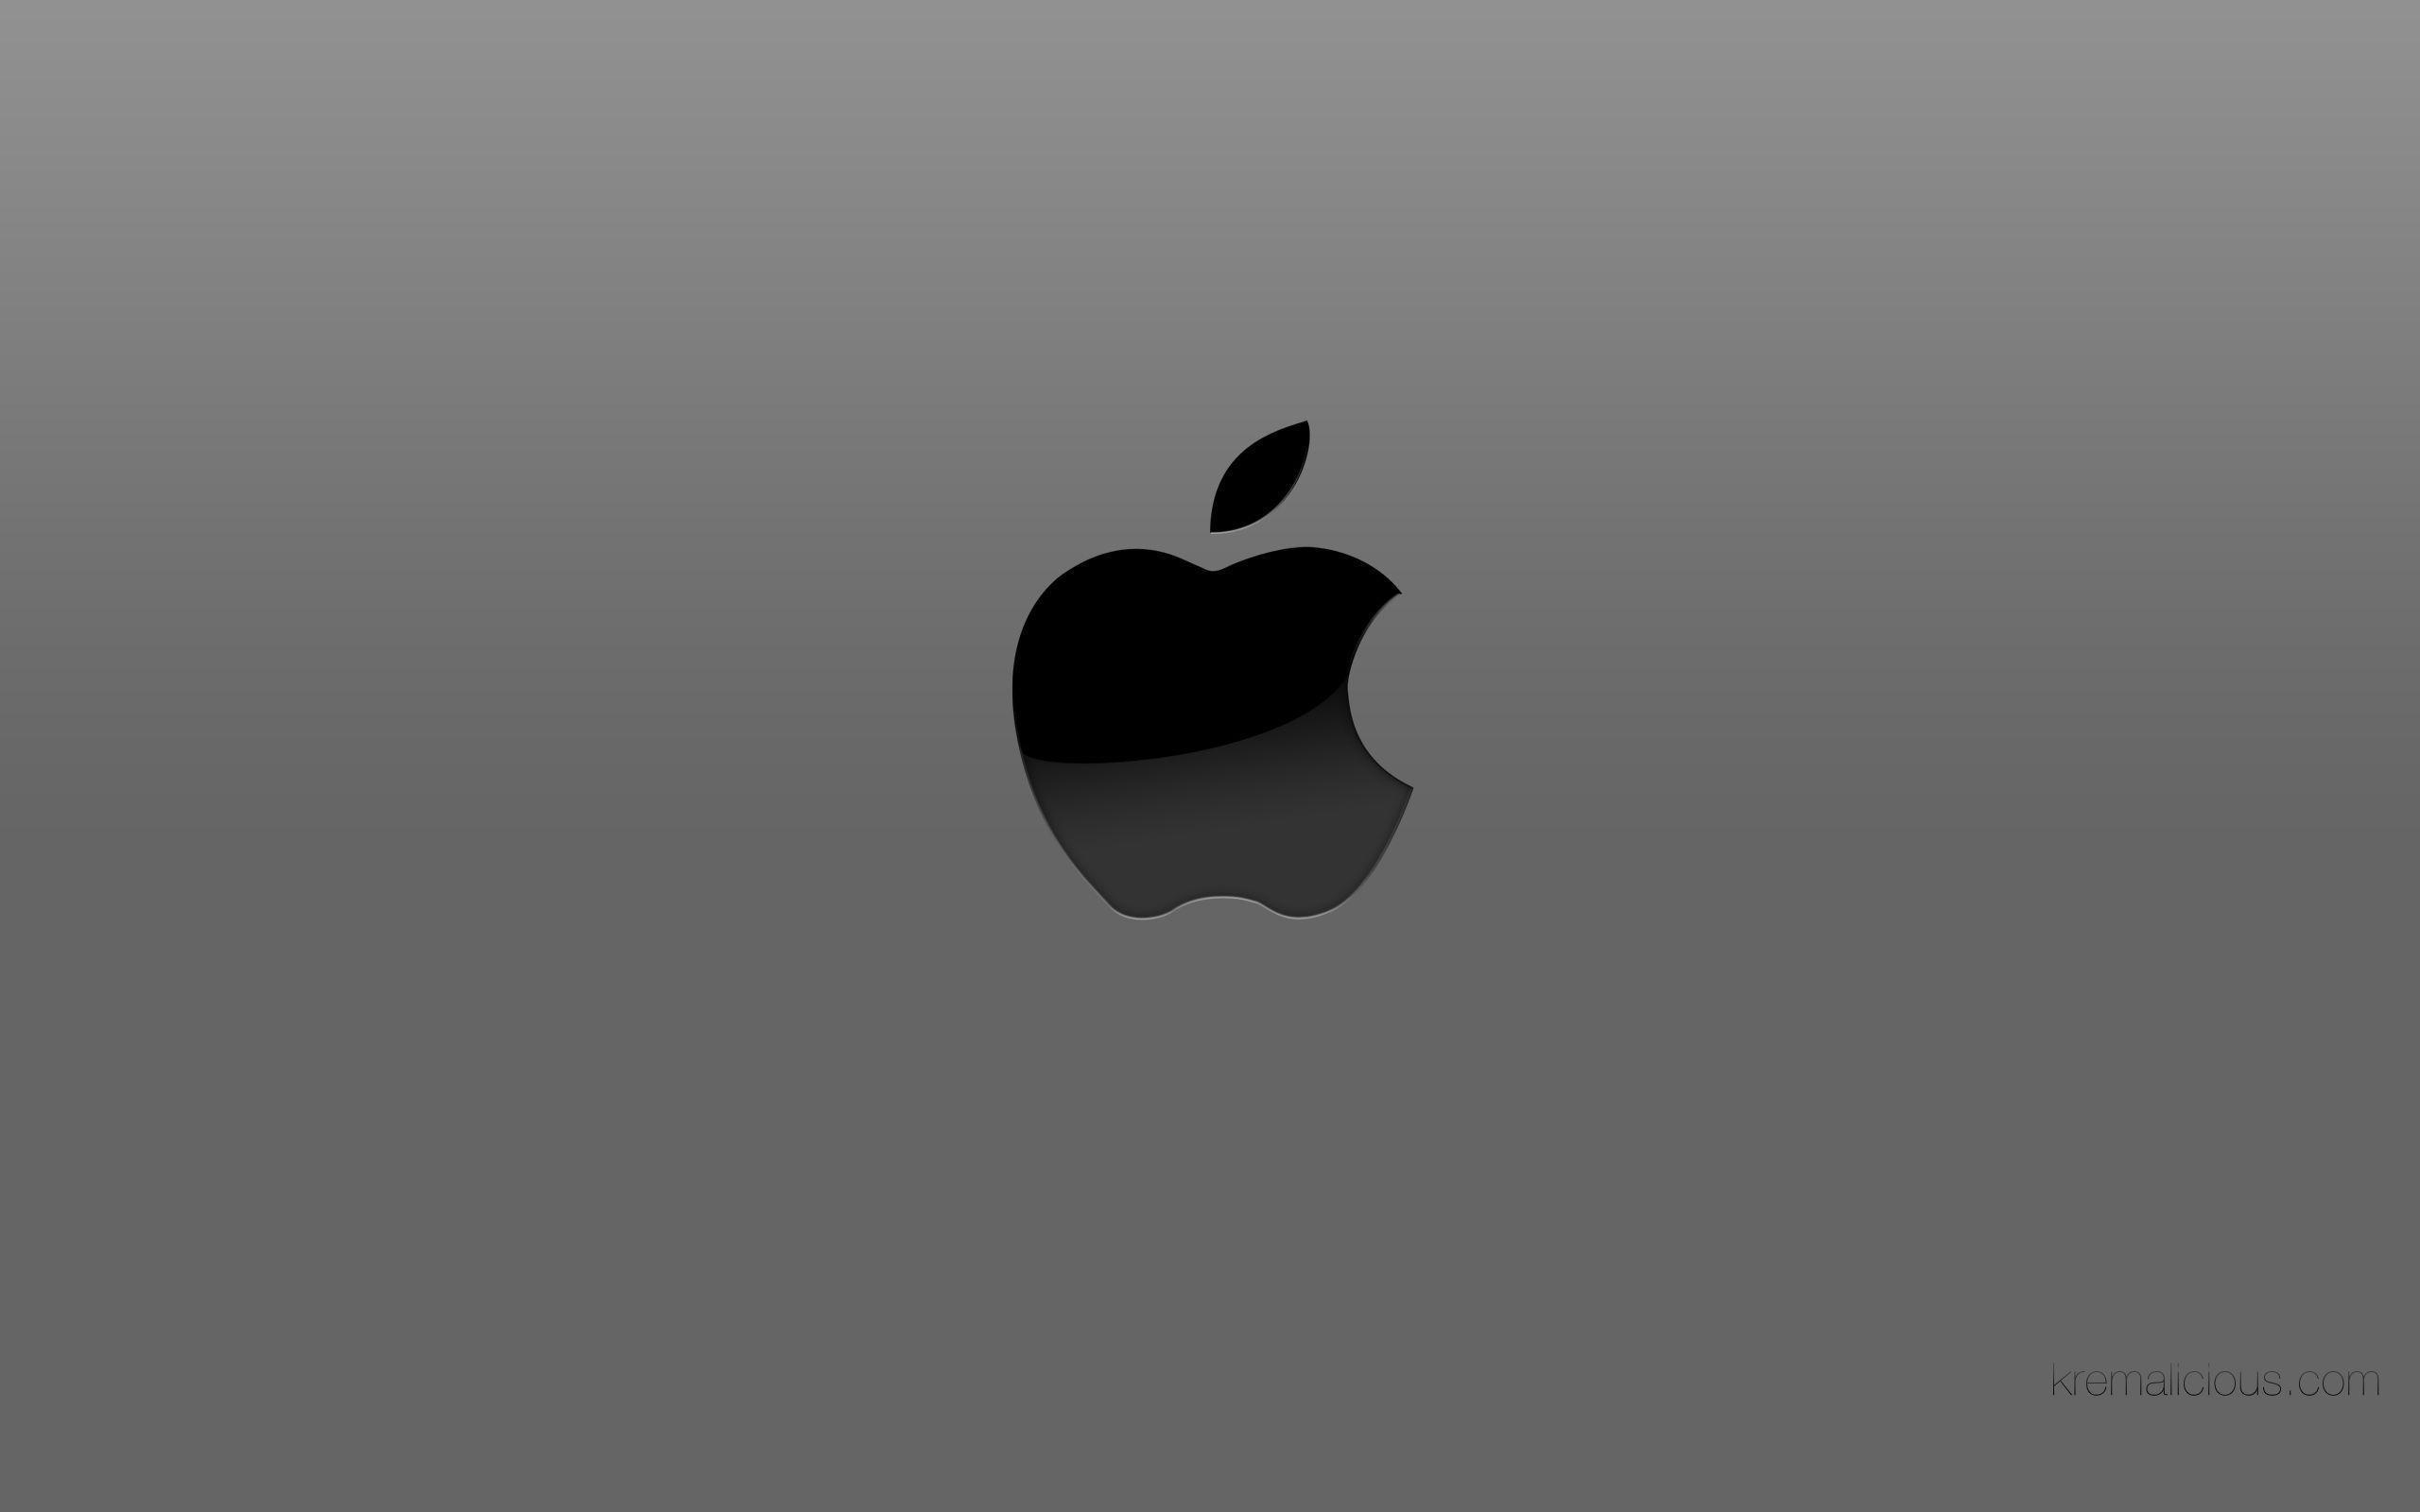 Logos For > Hd Apple Logo Wallpaper